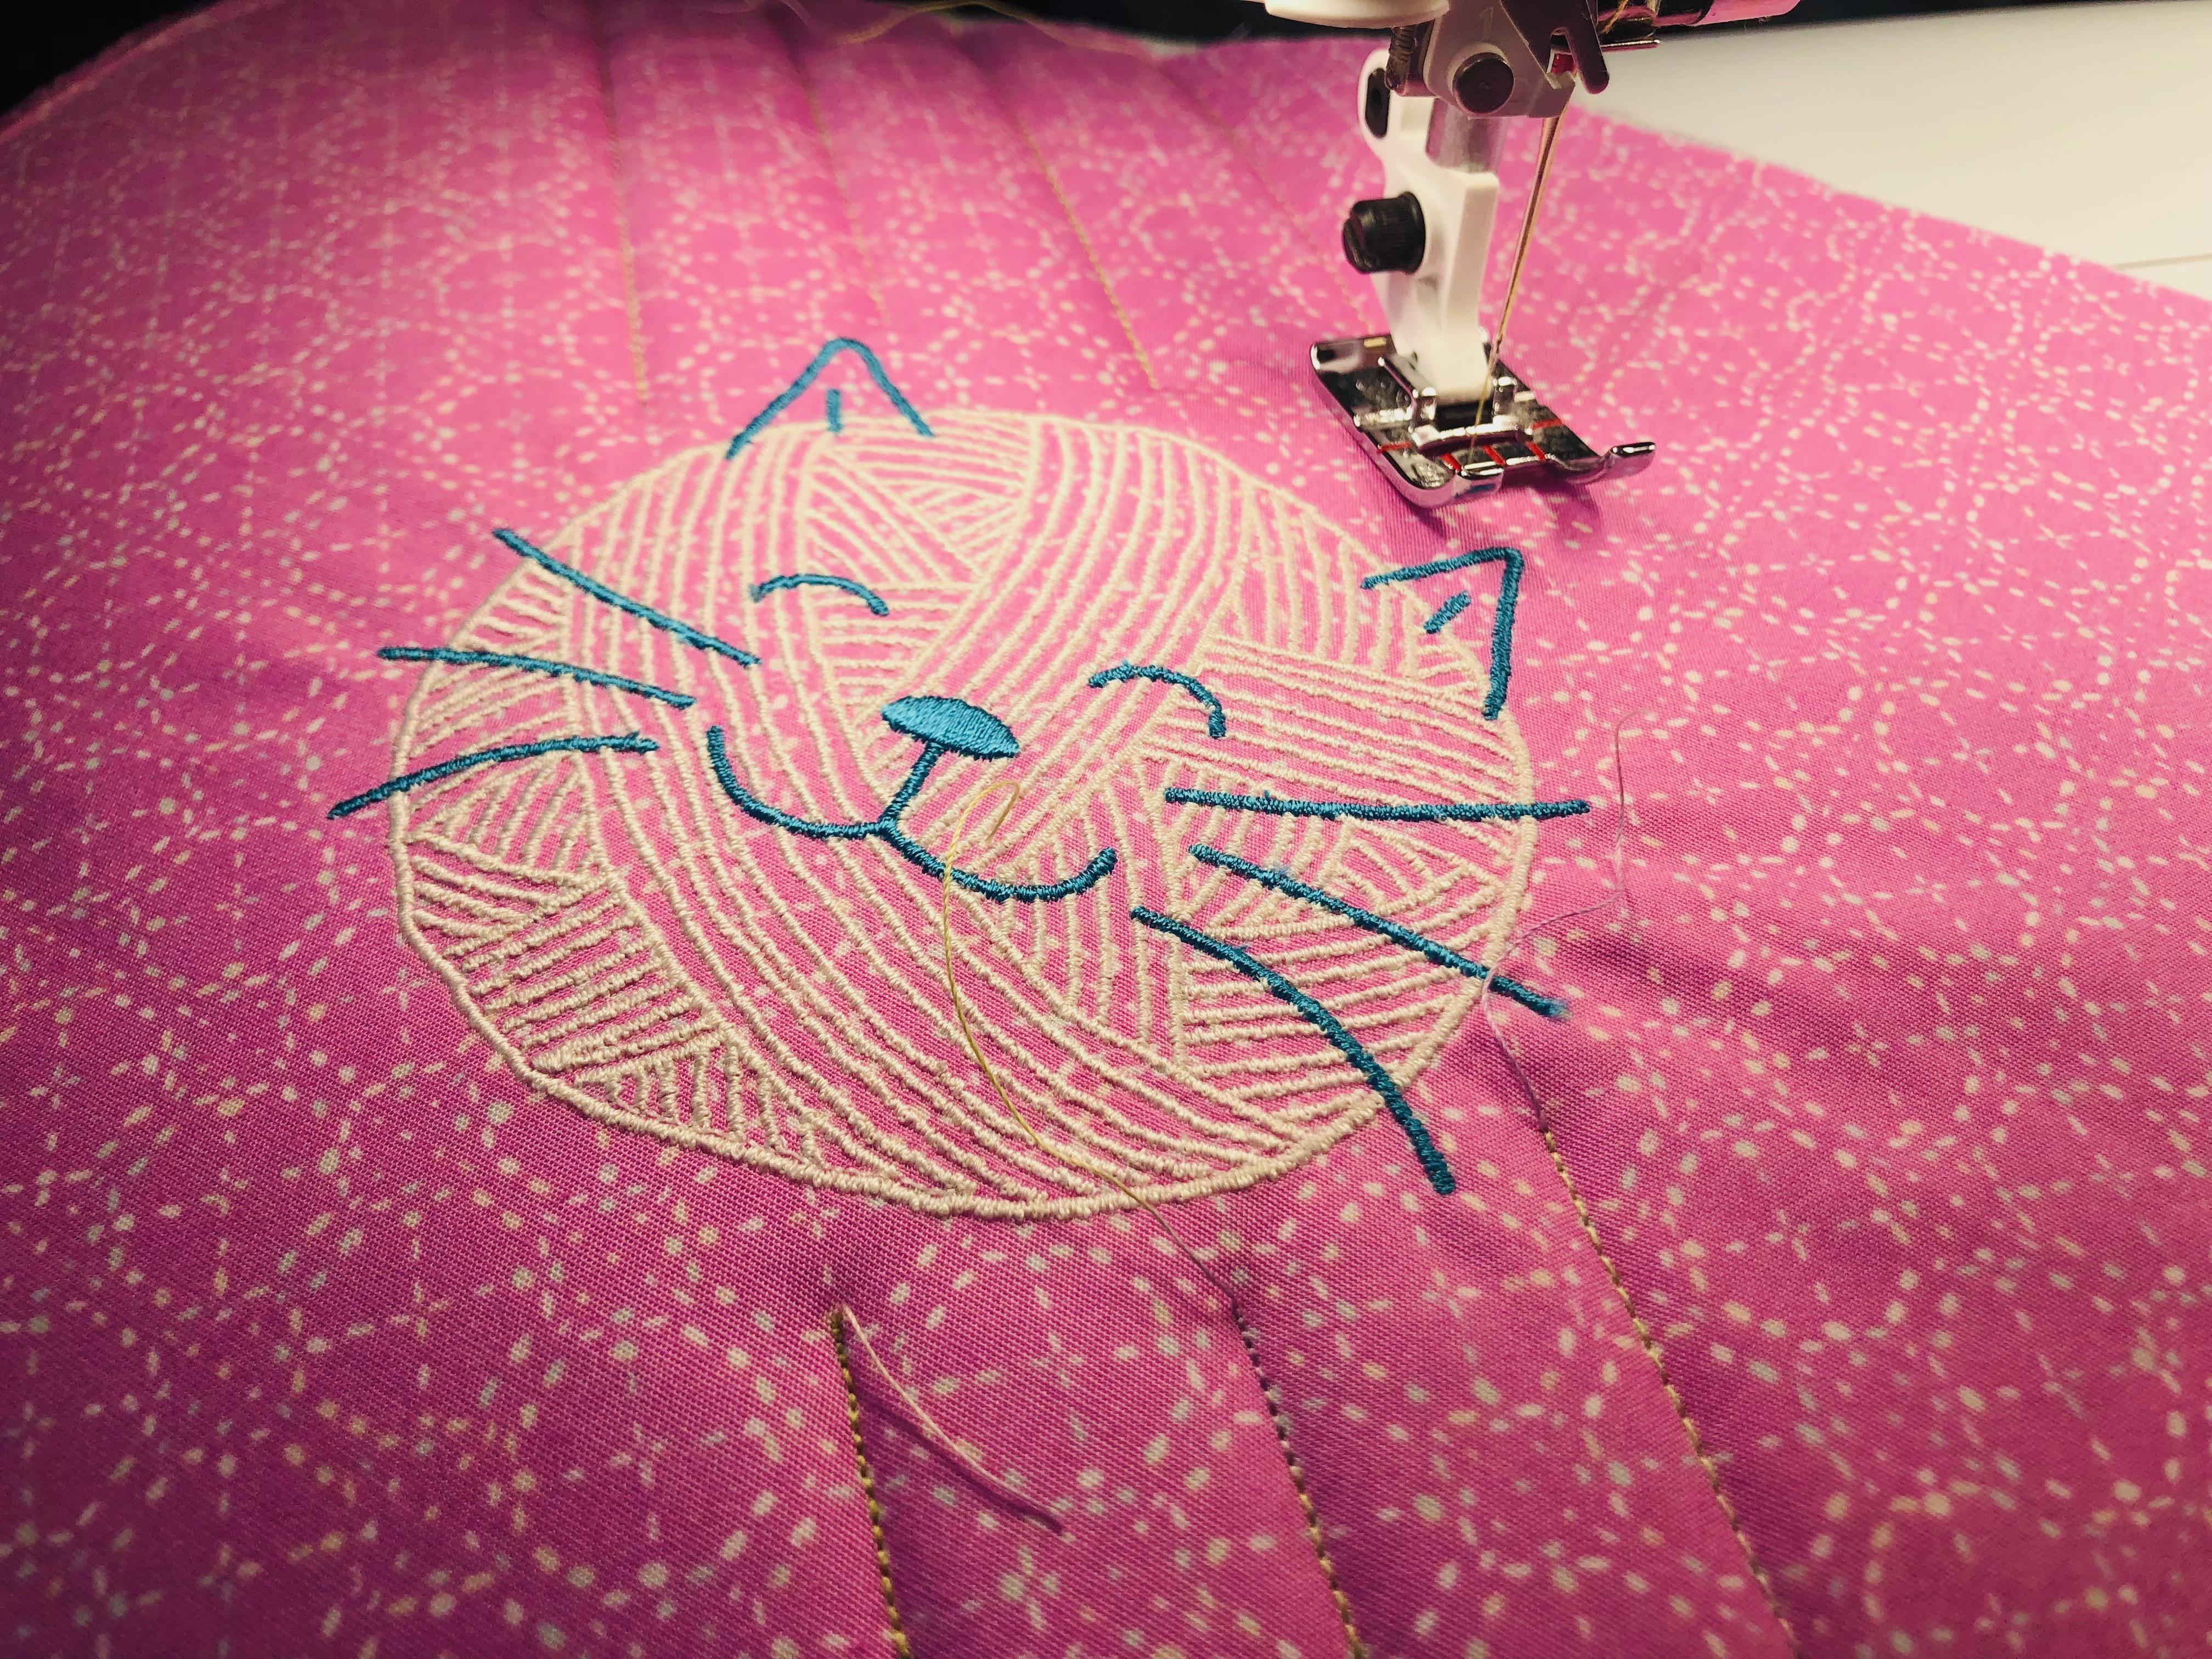 yarn cat embroidery